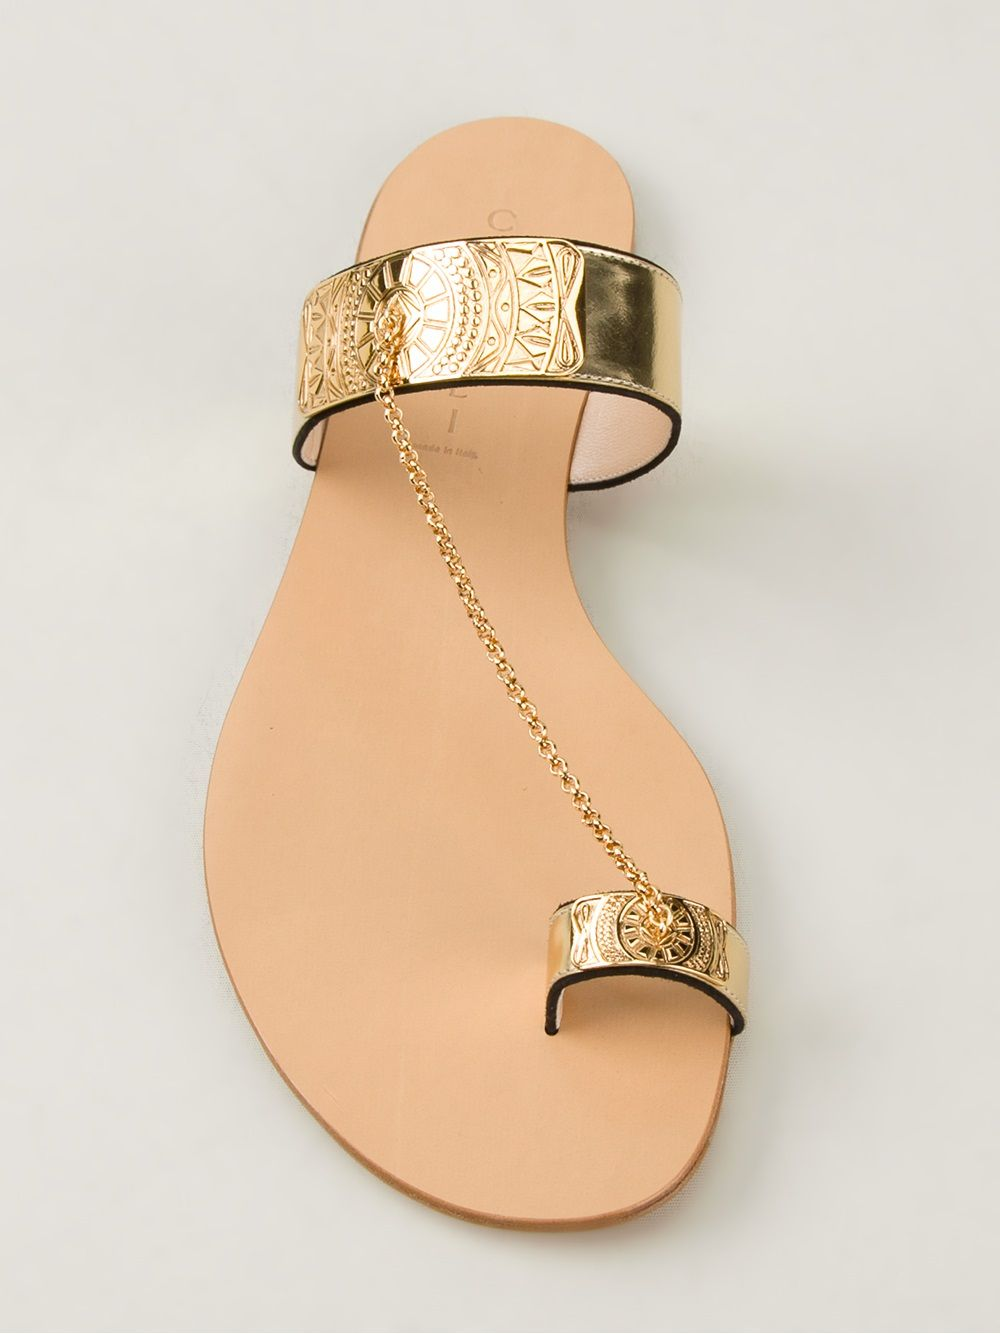 Stella Mccartney Gold Chain Flat Sandal At Barneys Com Flat Sandals Sandals Stella Mccartney